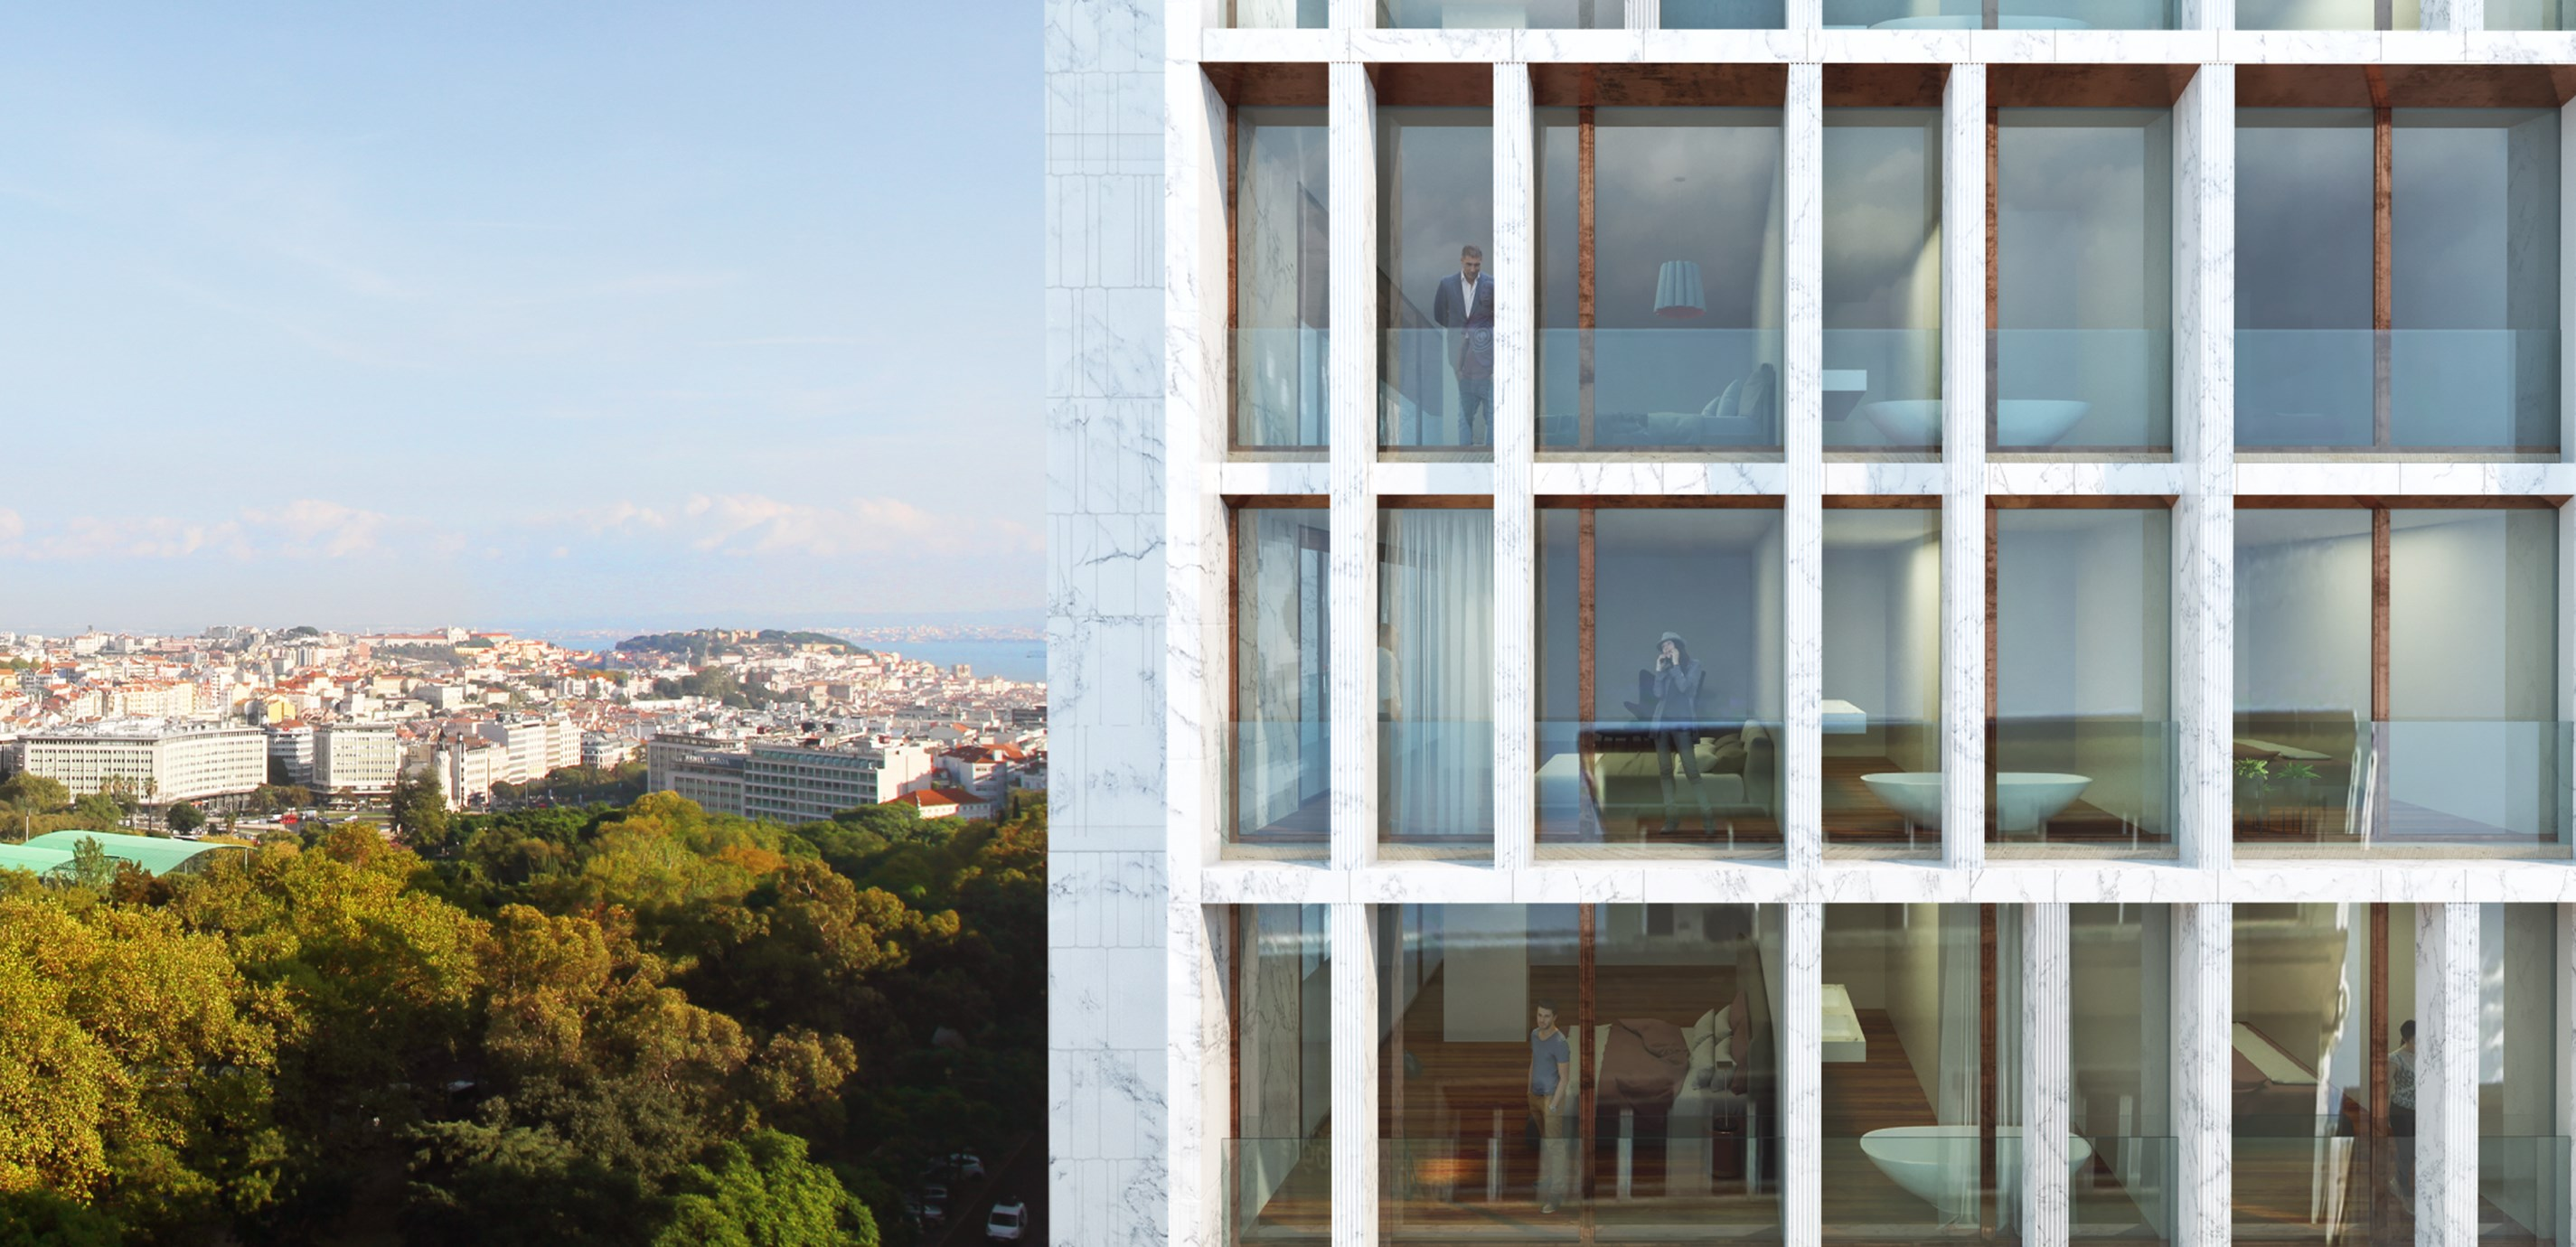 Edifício Castilho 203, ARX Portugal Arquitectos / Vanguard Properties